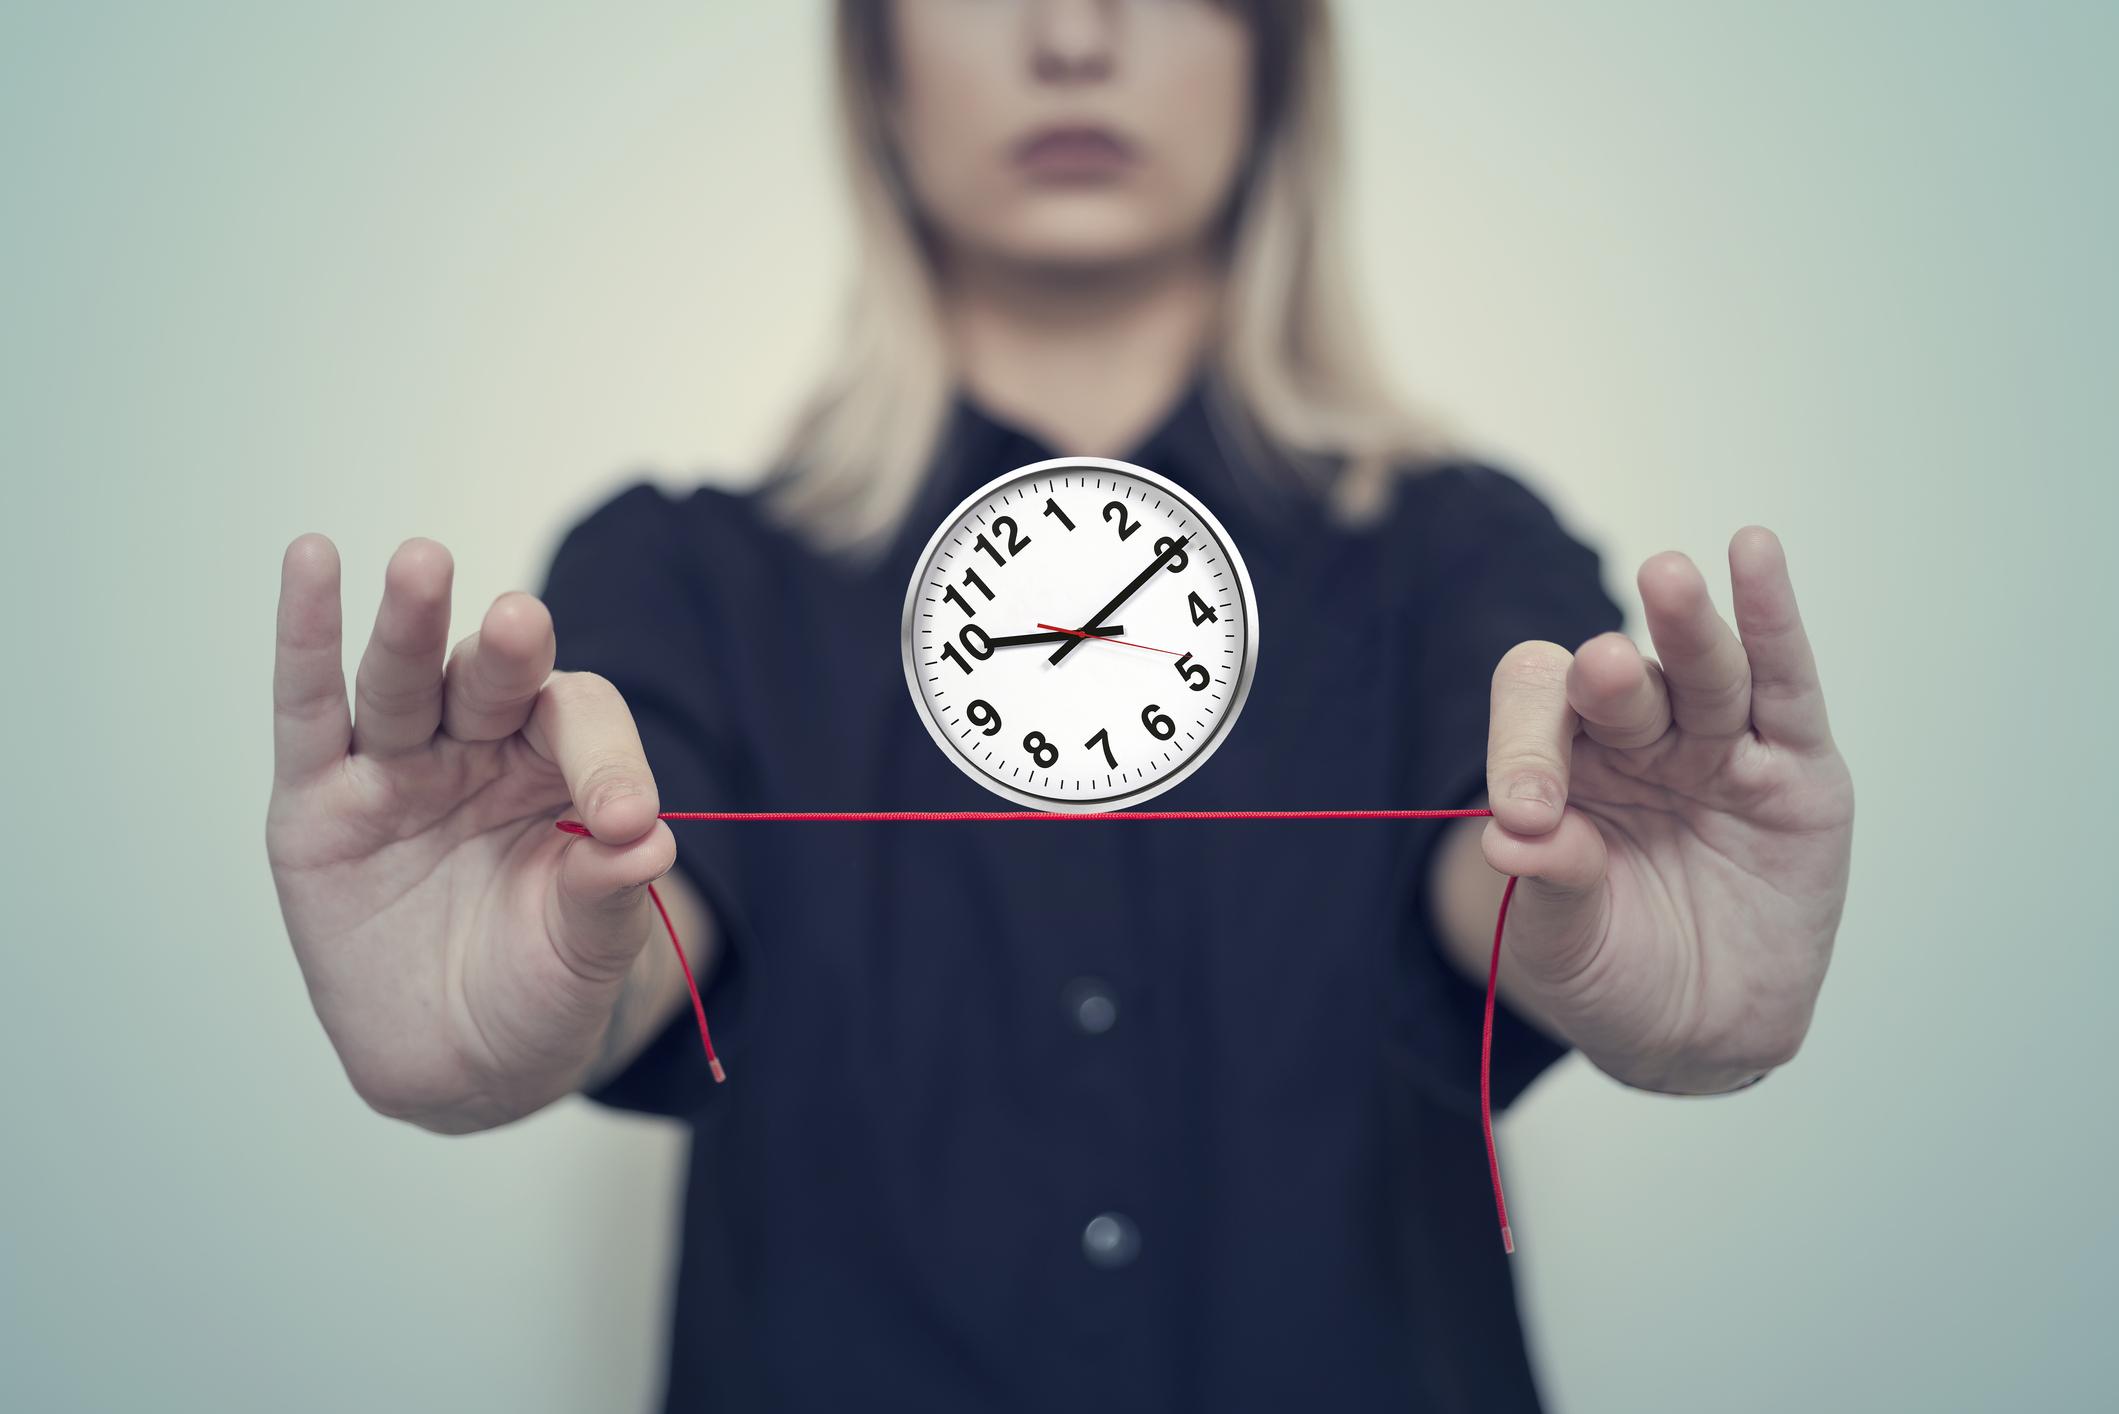 Tangan wanita memegang jam dinding dengan keseimbangan seutas benang